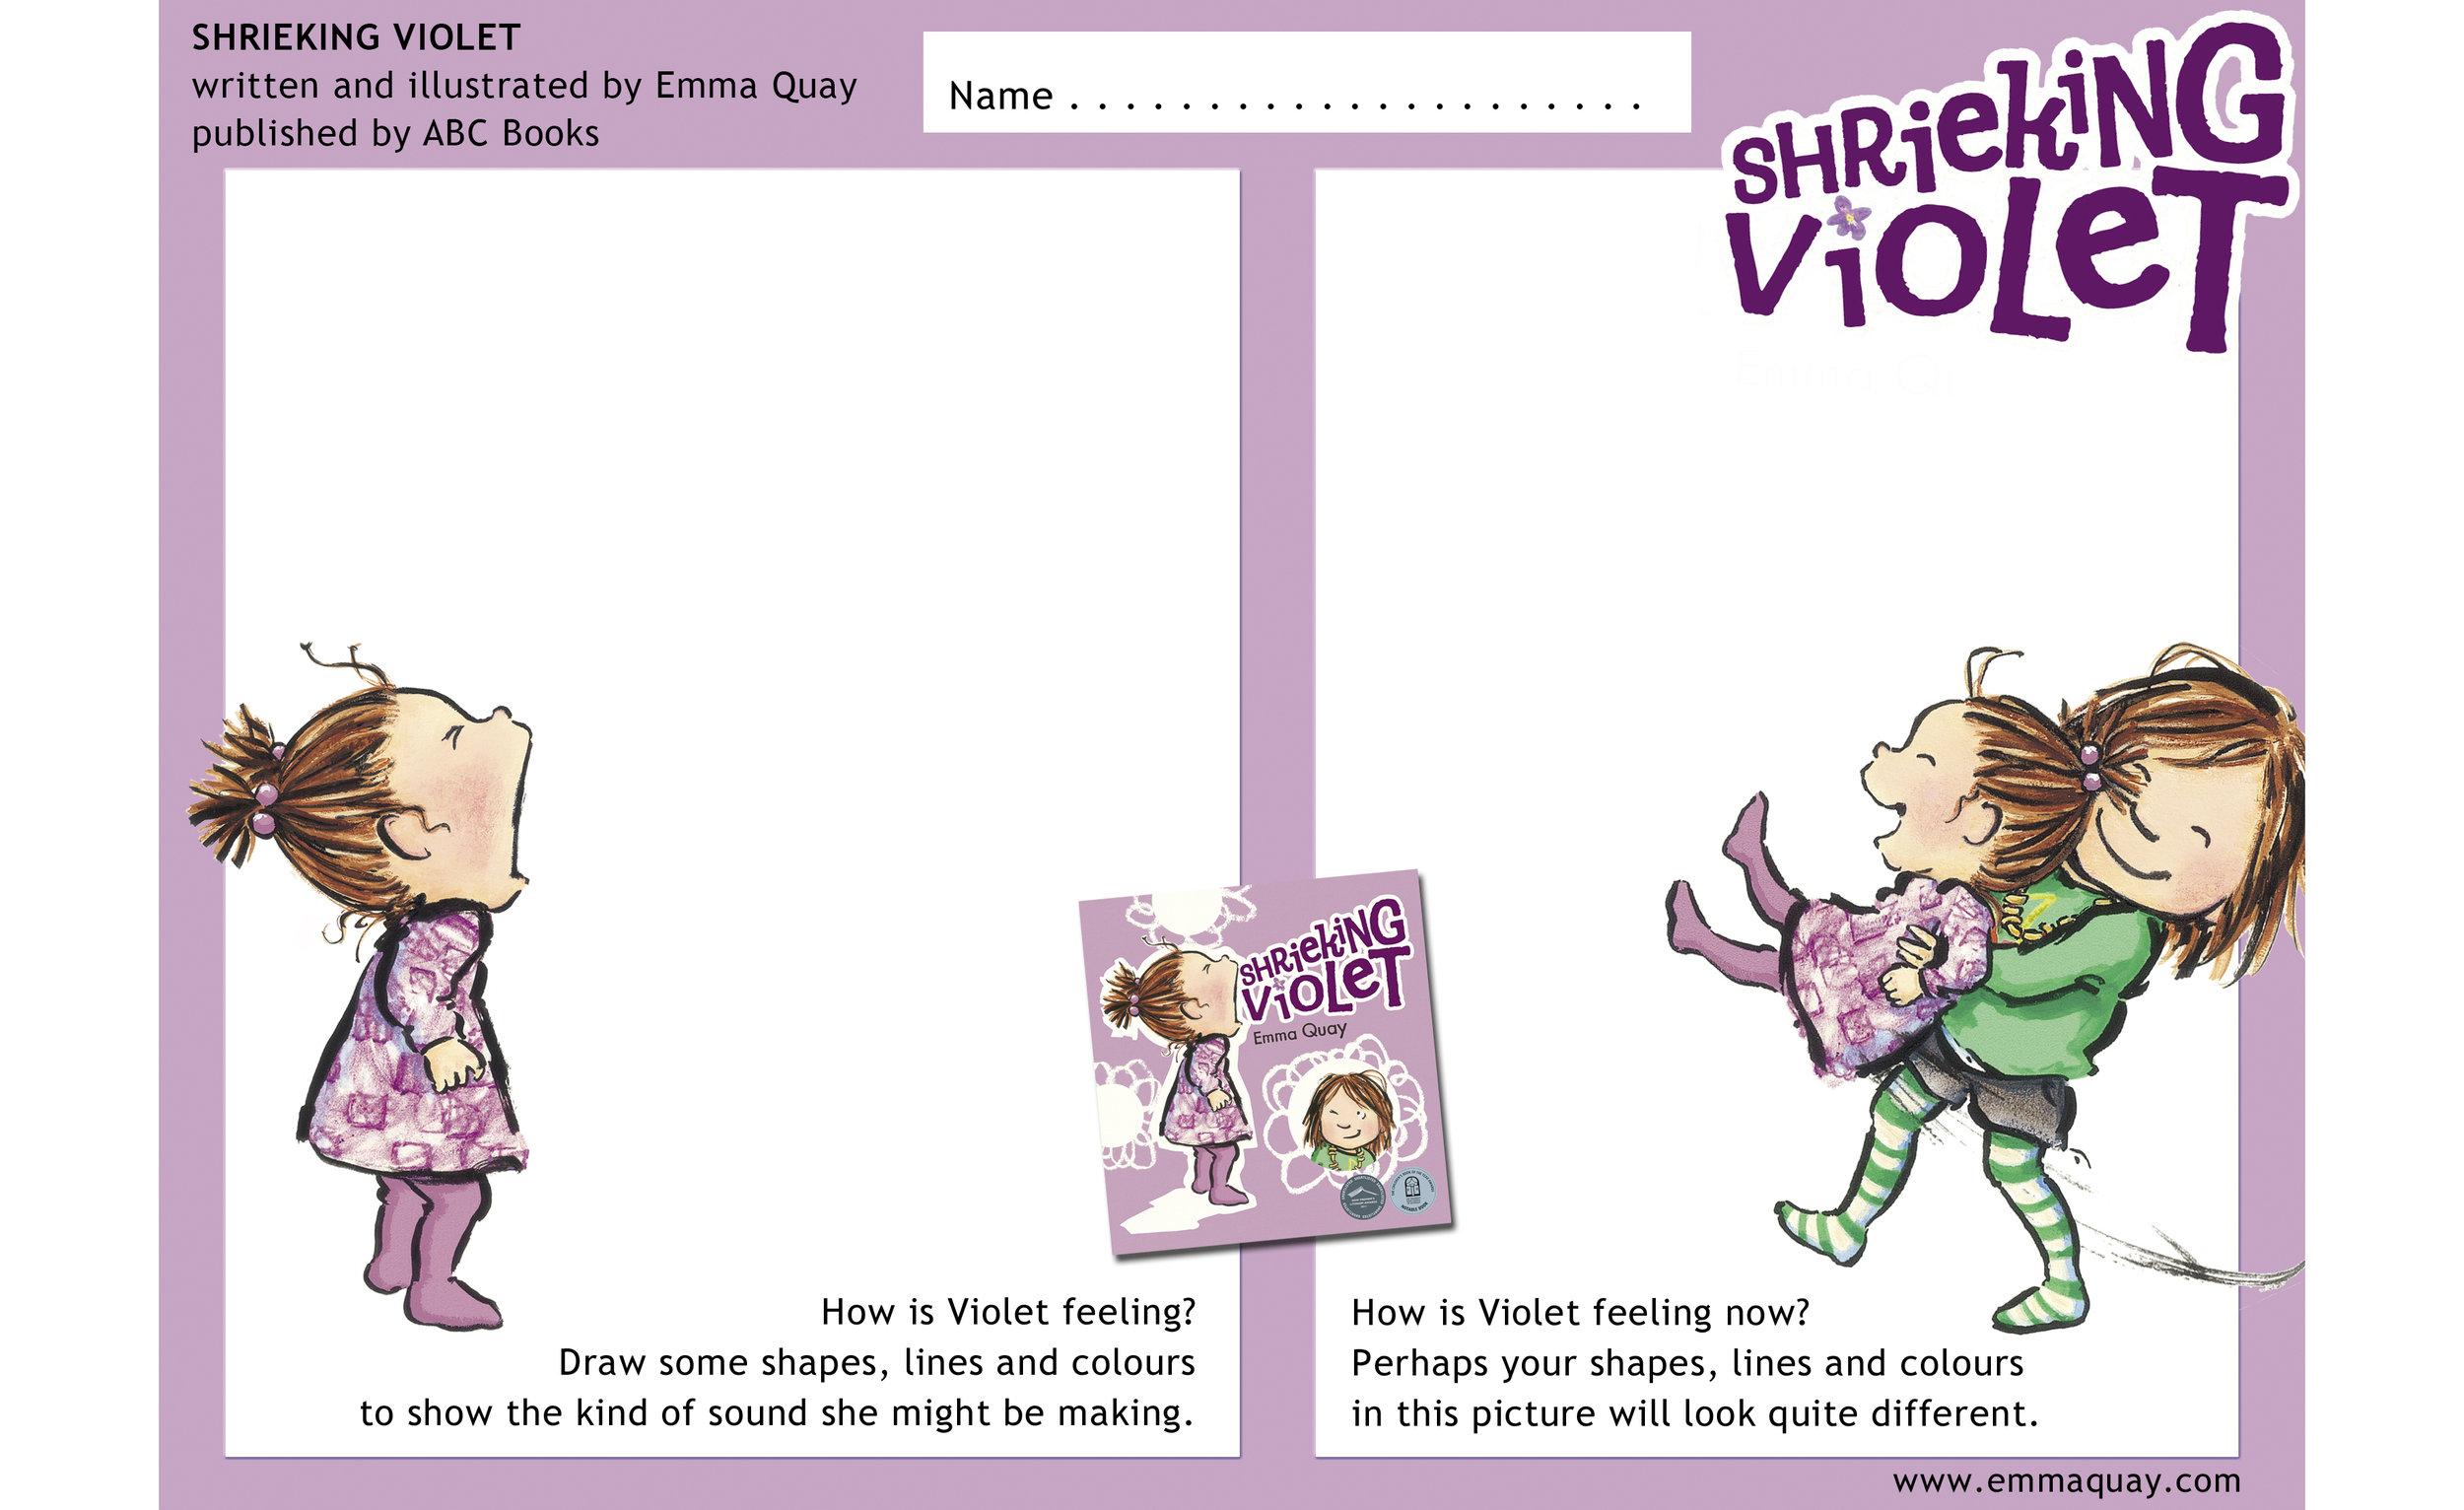 SHRIEKING VIOLET drawing activity • http://www.emmaquay.com